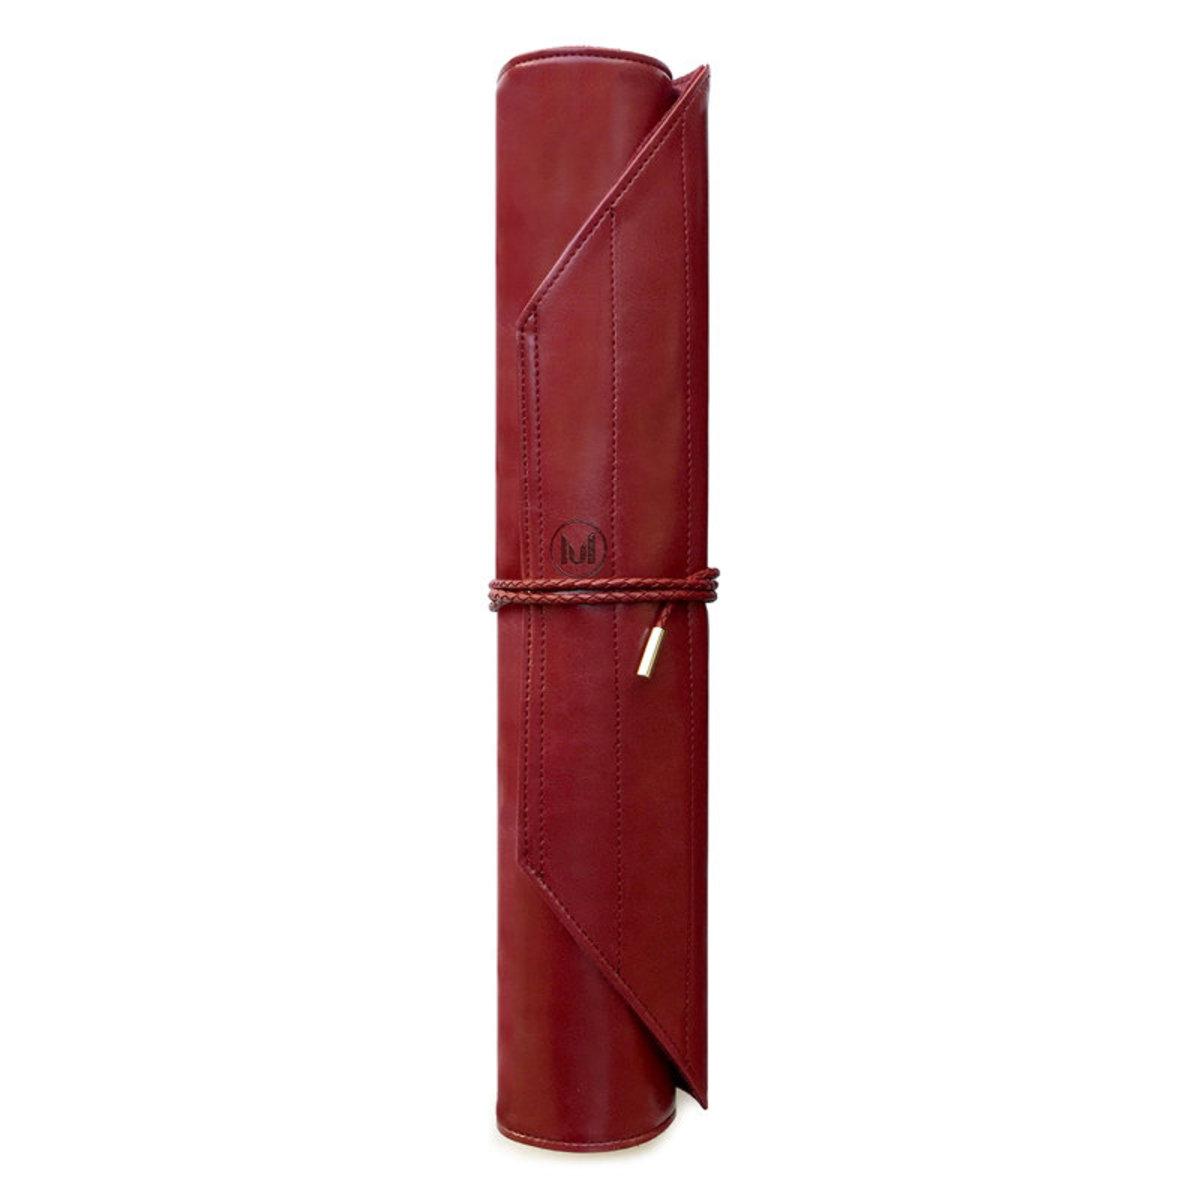 ContRoll9 - Artist L, 捲軸型工具袋 (紫紅色)